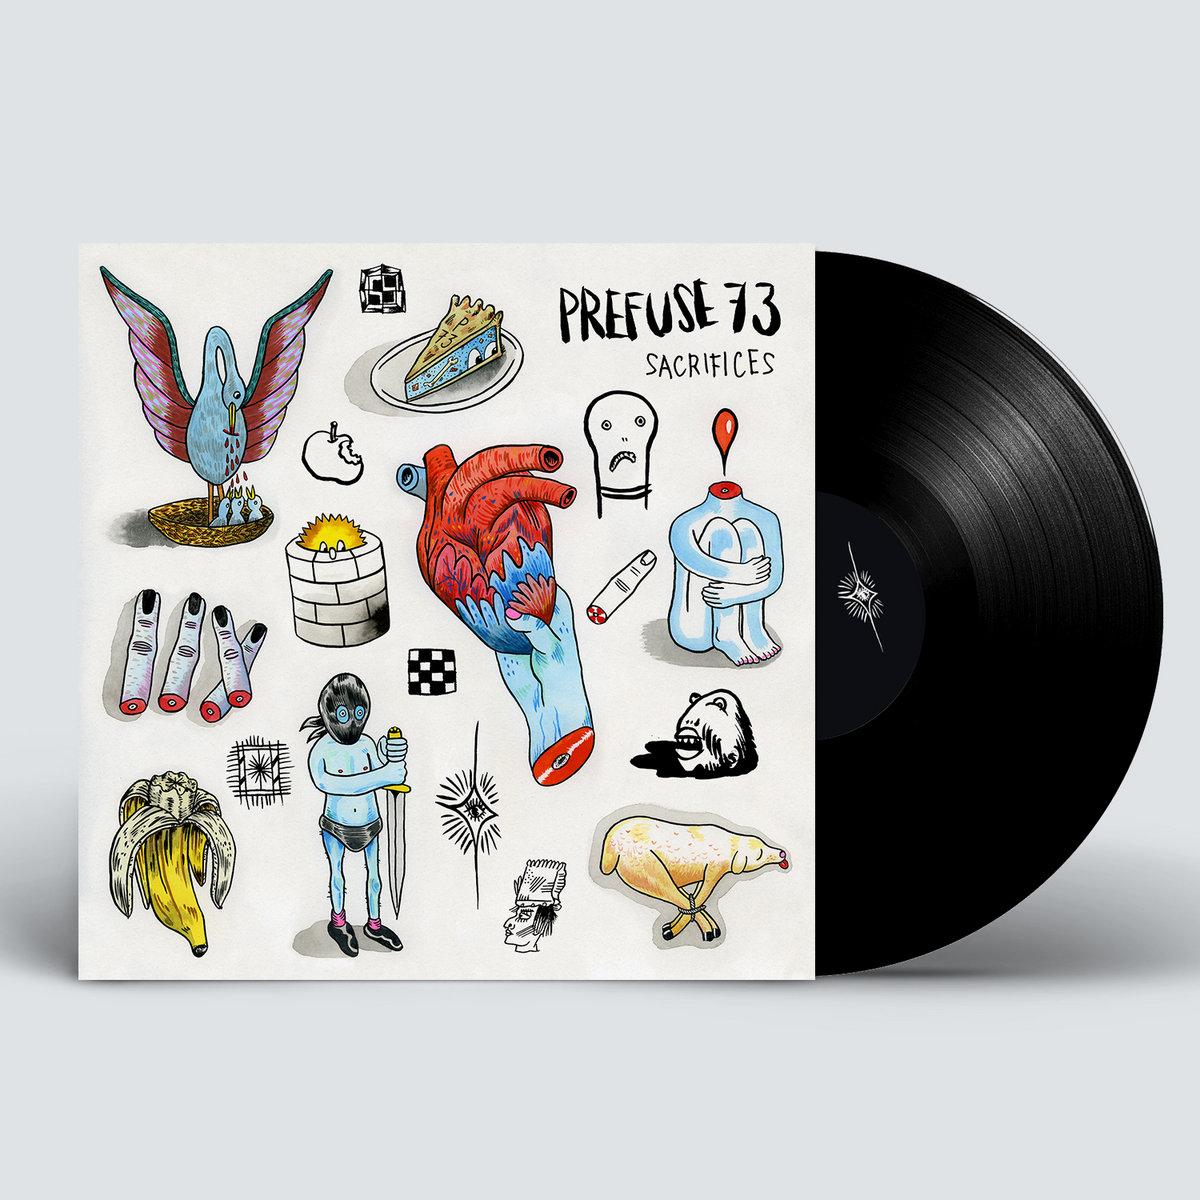 "12"" Vinyl LP"